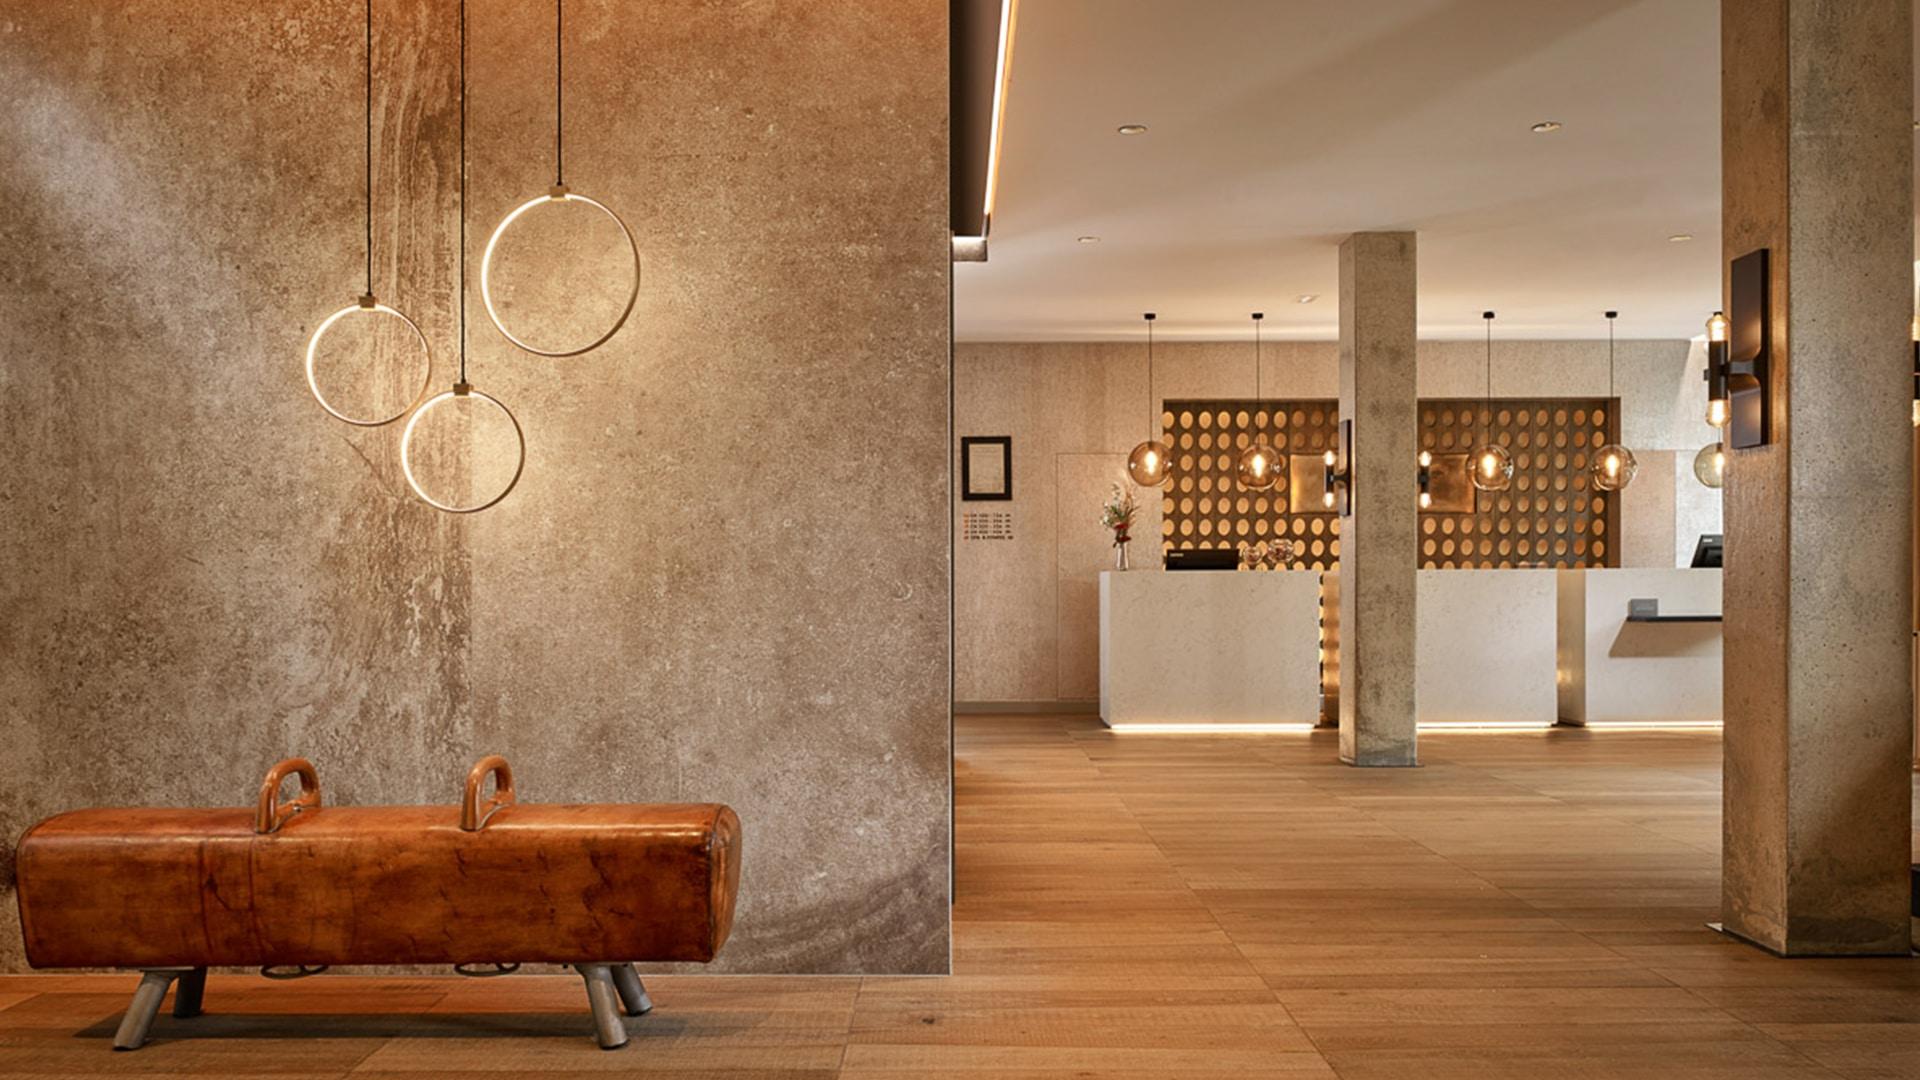 Hôtels spa de France : la Caserne Chanzy